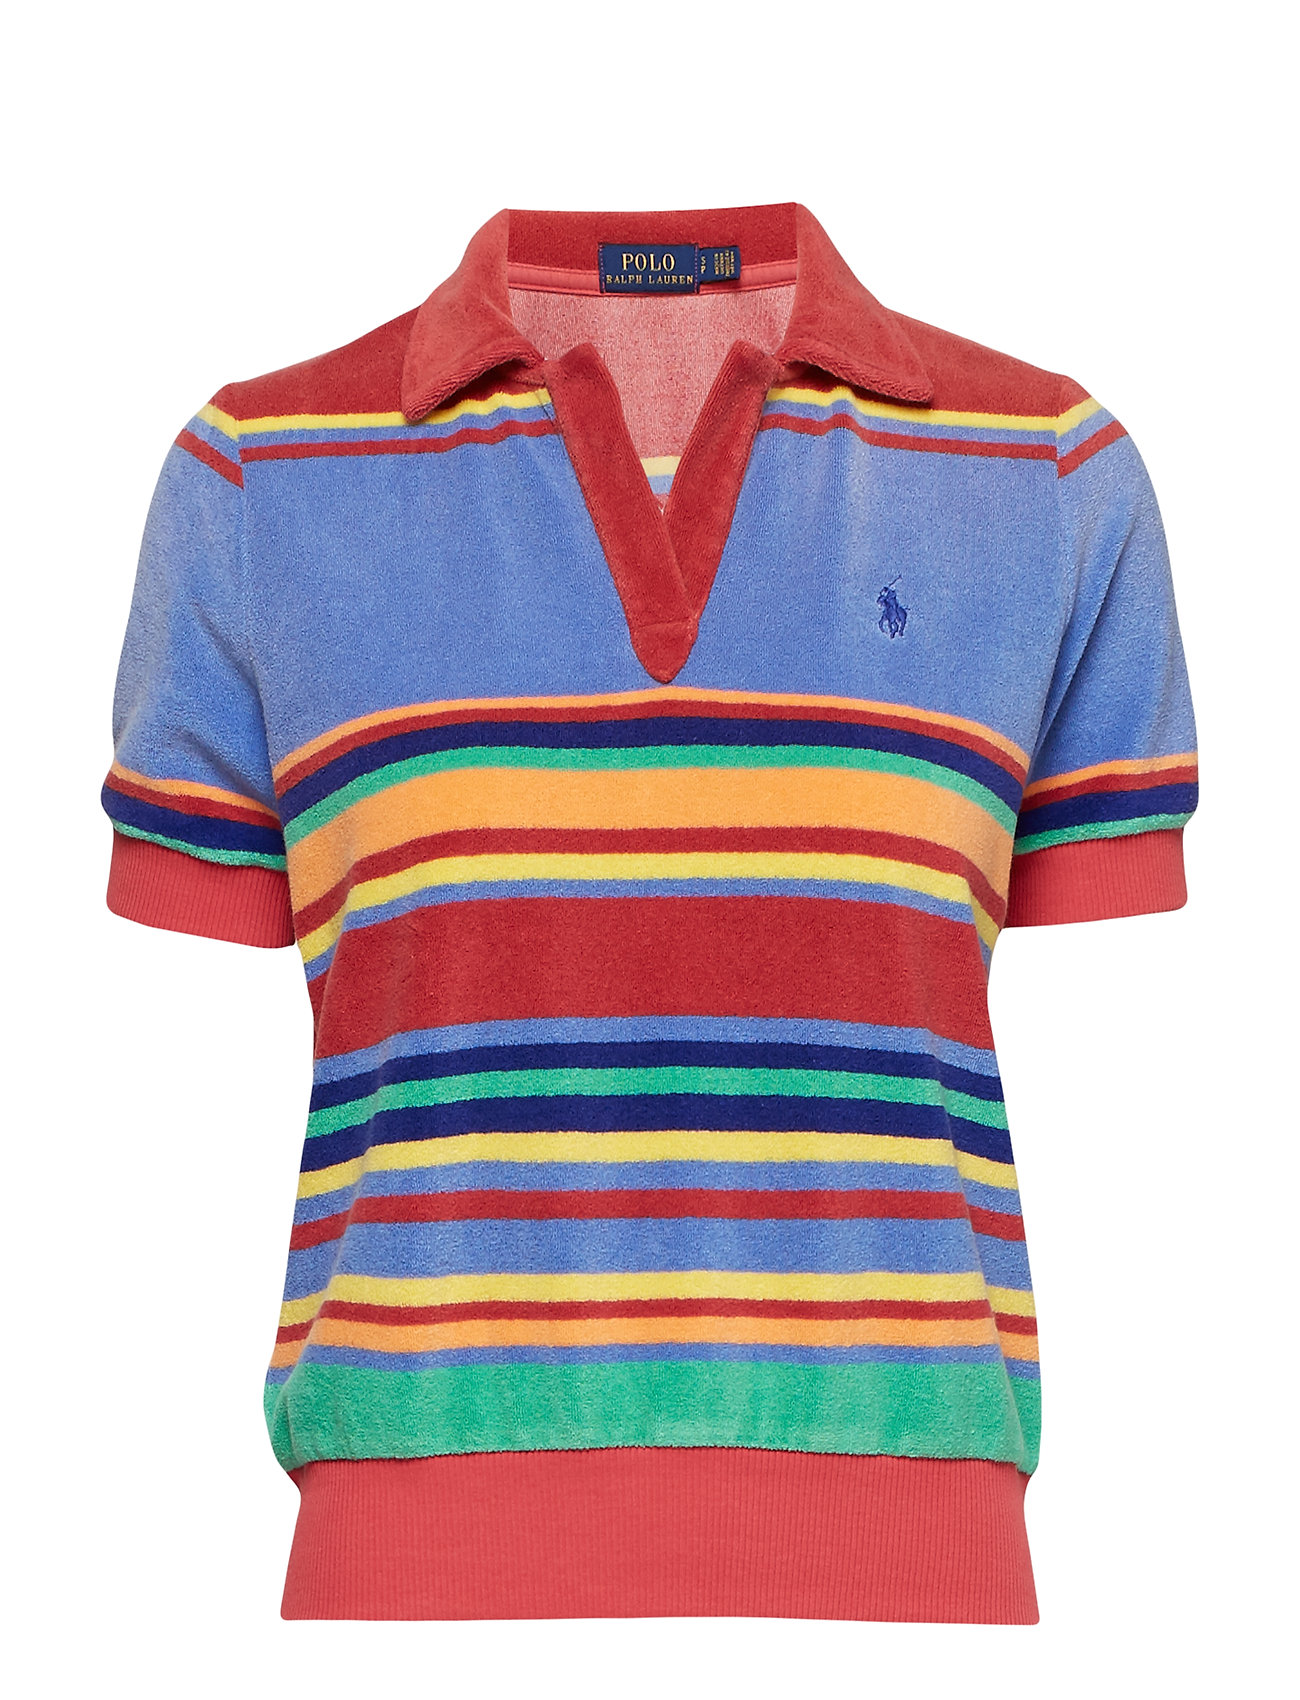 Polo Ralph Lauren French Terry Polo Shirt